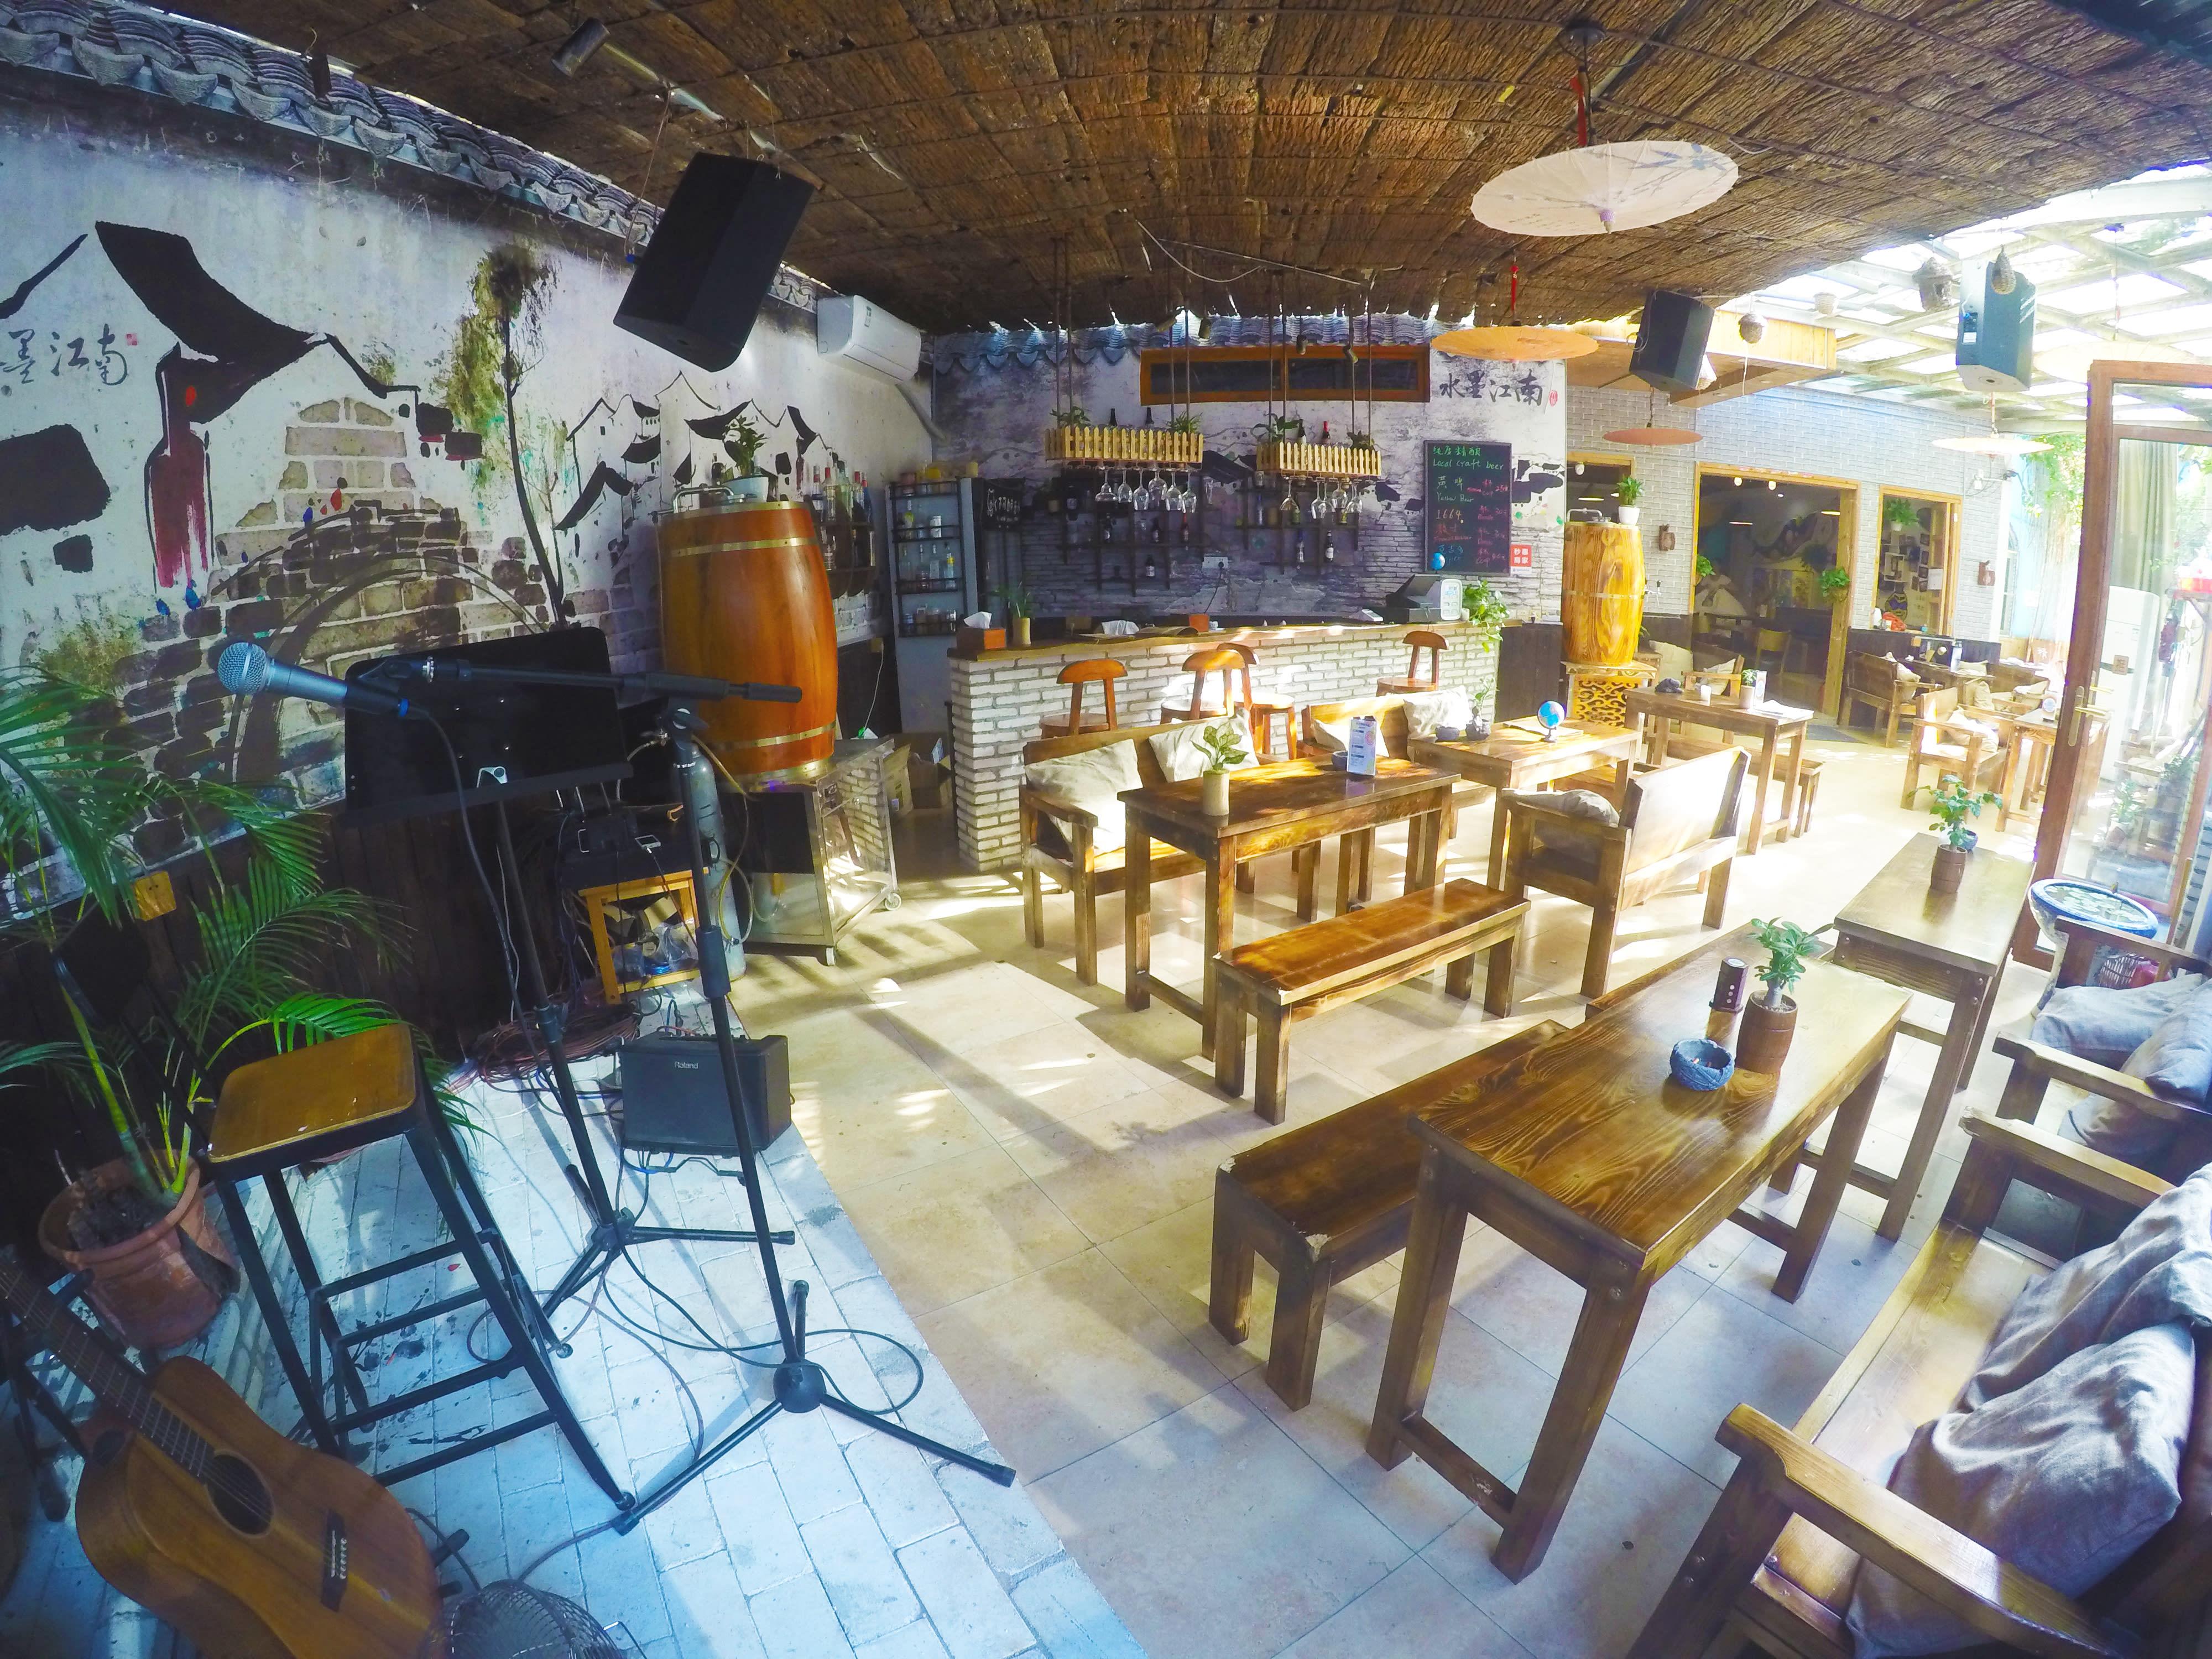 Sanya Blue Sky International Youth Hostel